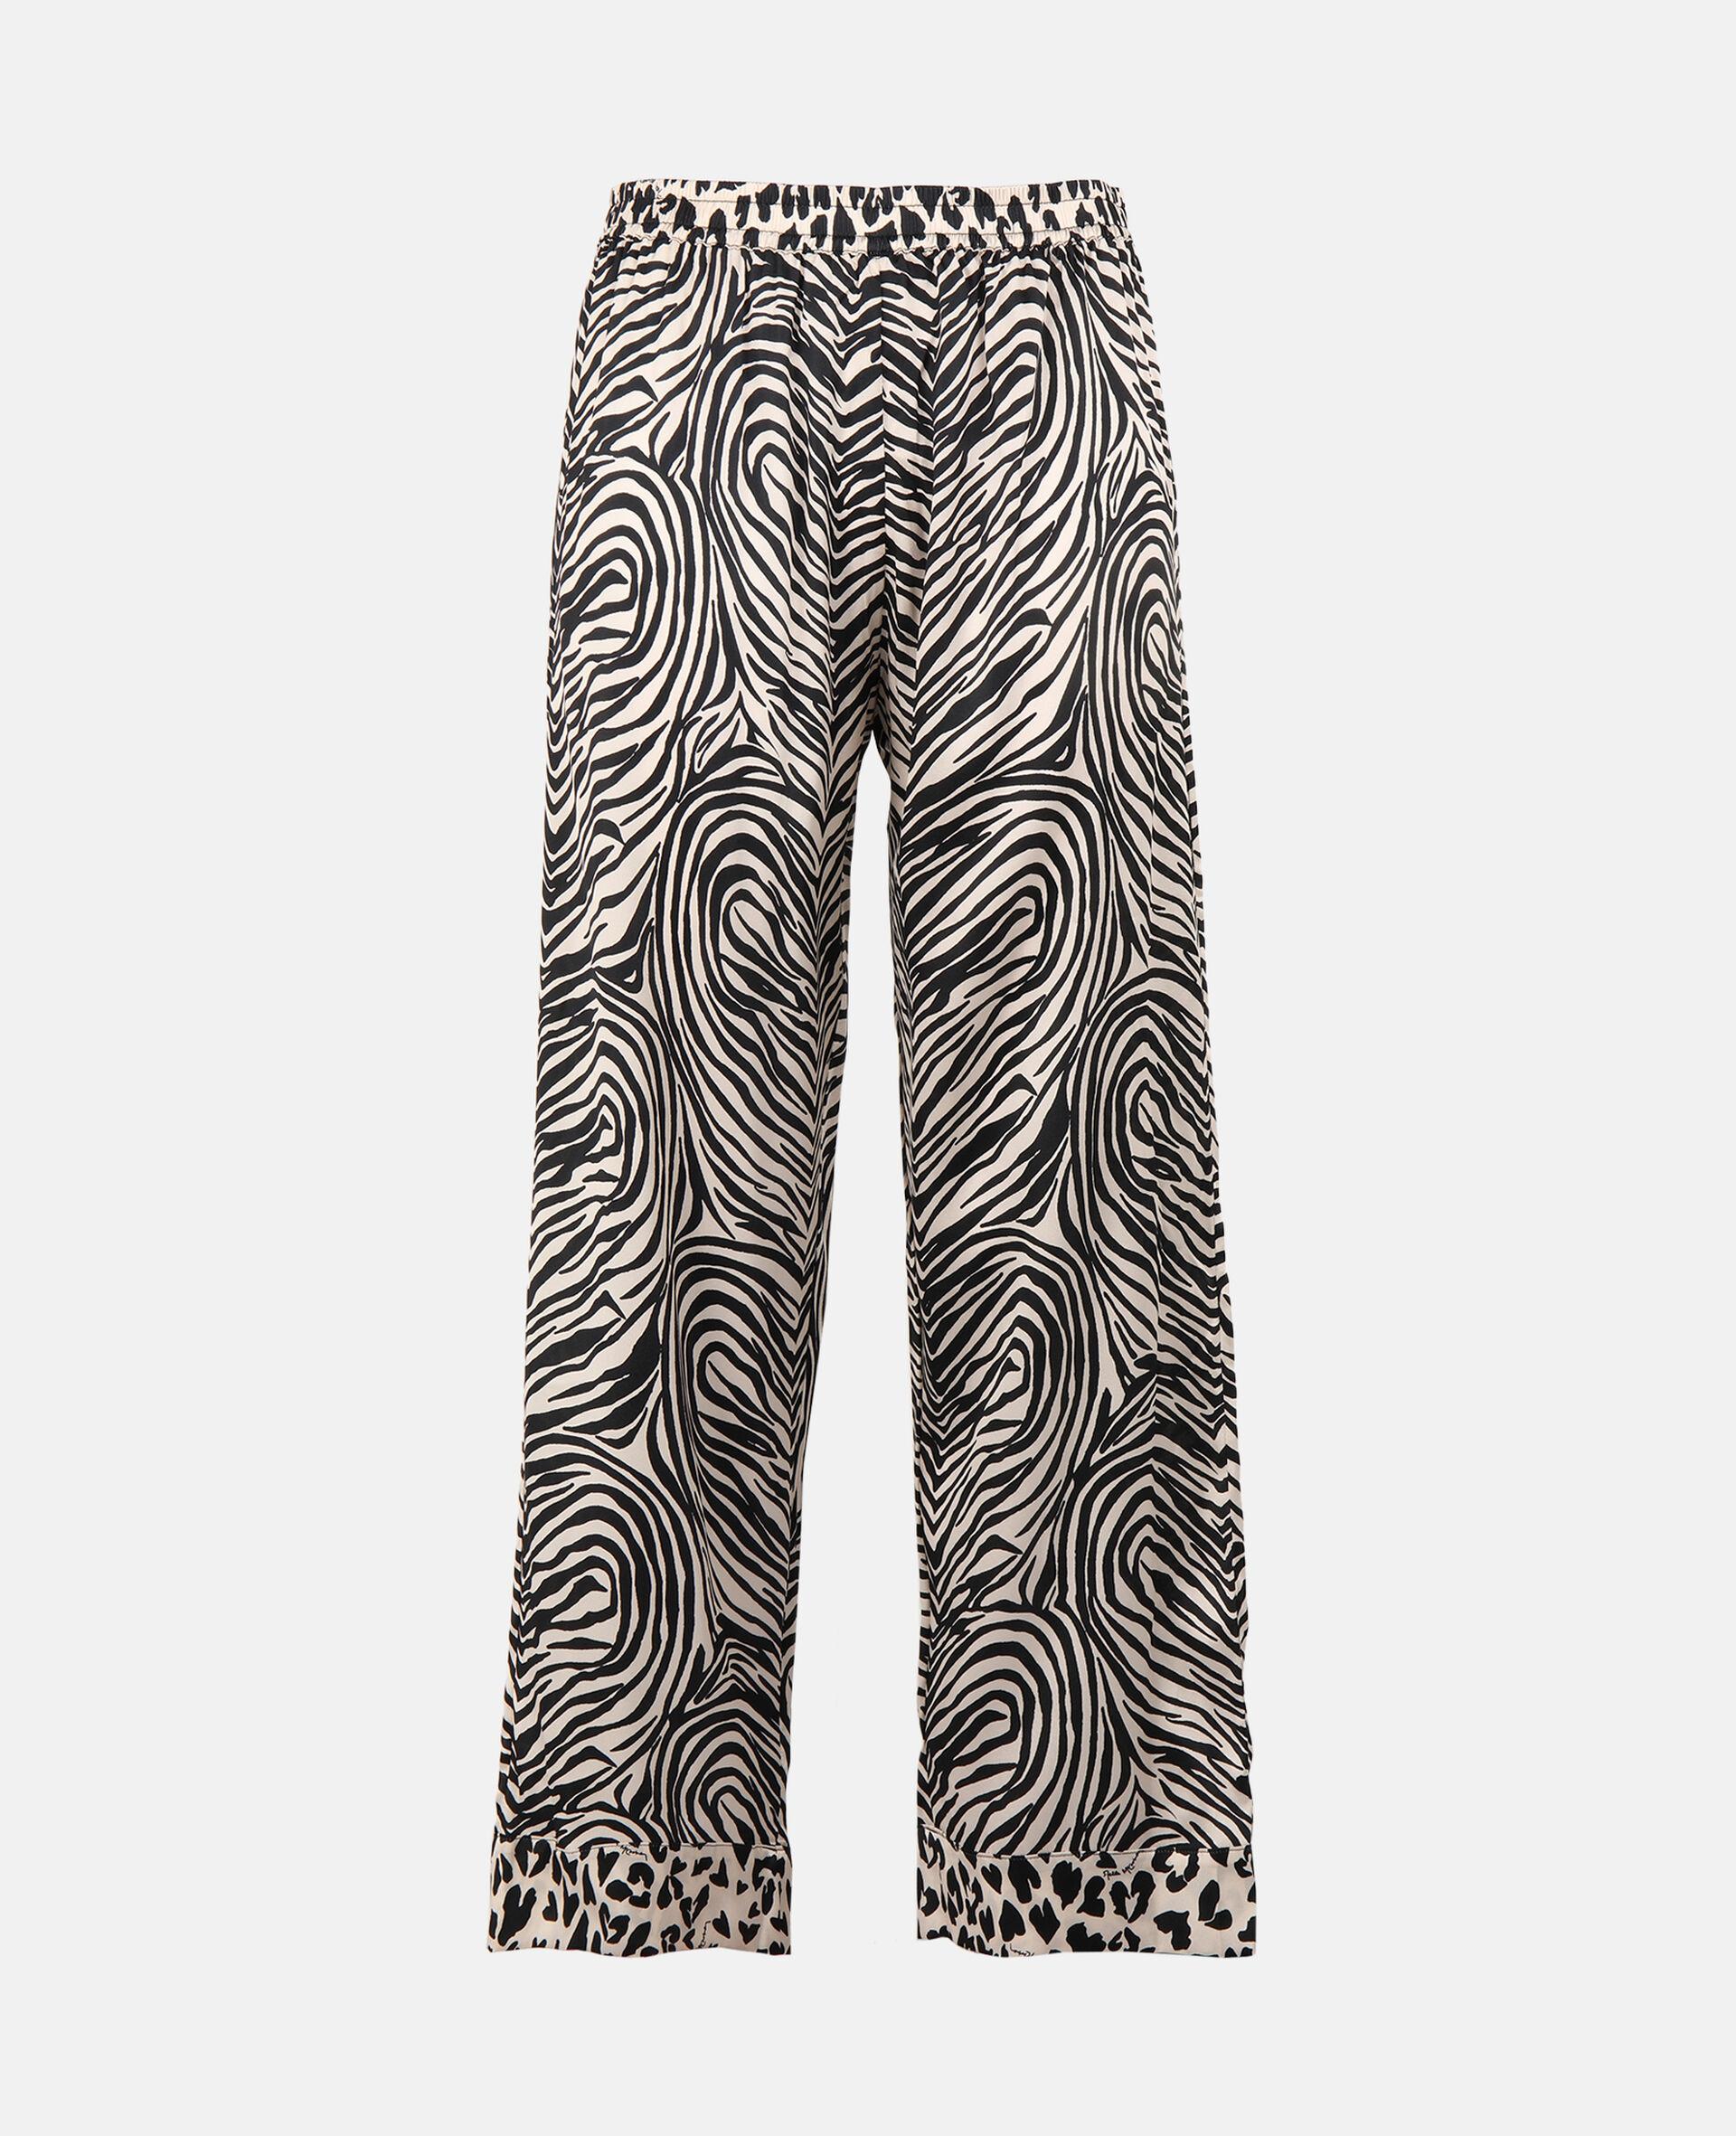 Maggie Twisting Pants-Beige-large image number 0